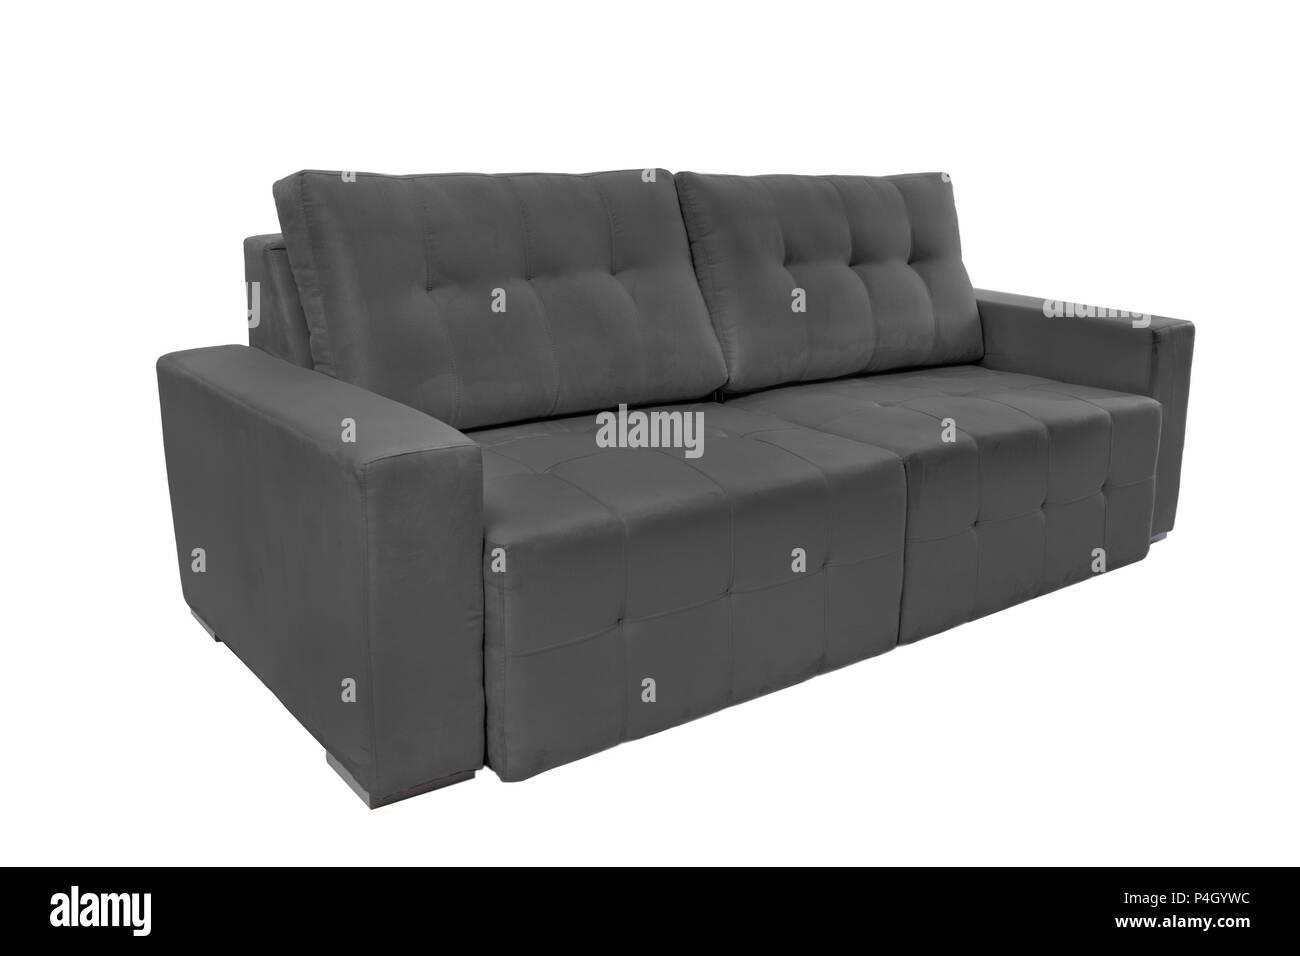 Three seats cozy fabric sofa isolated on white background - Stock Image